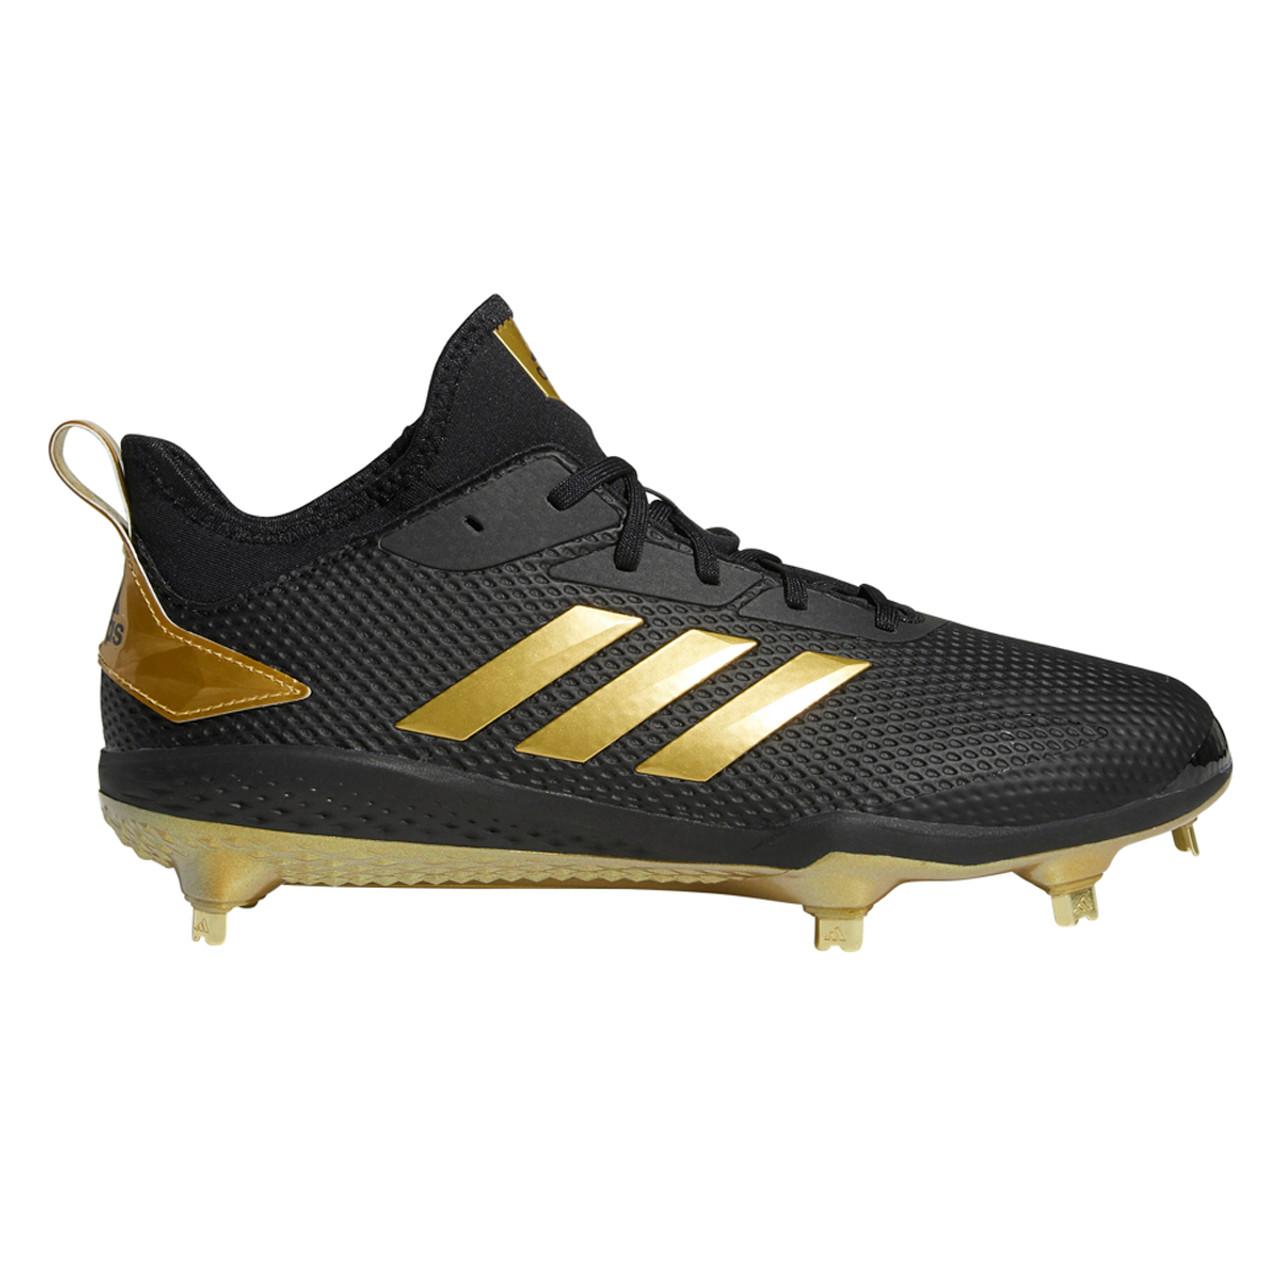 Adidas Afterburner V Black And Gold